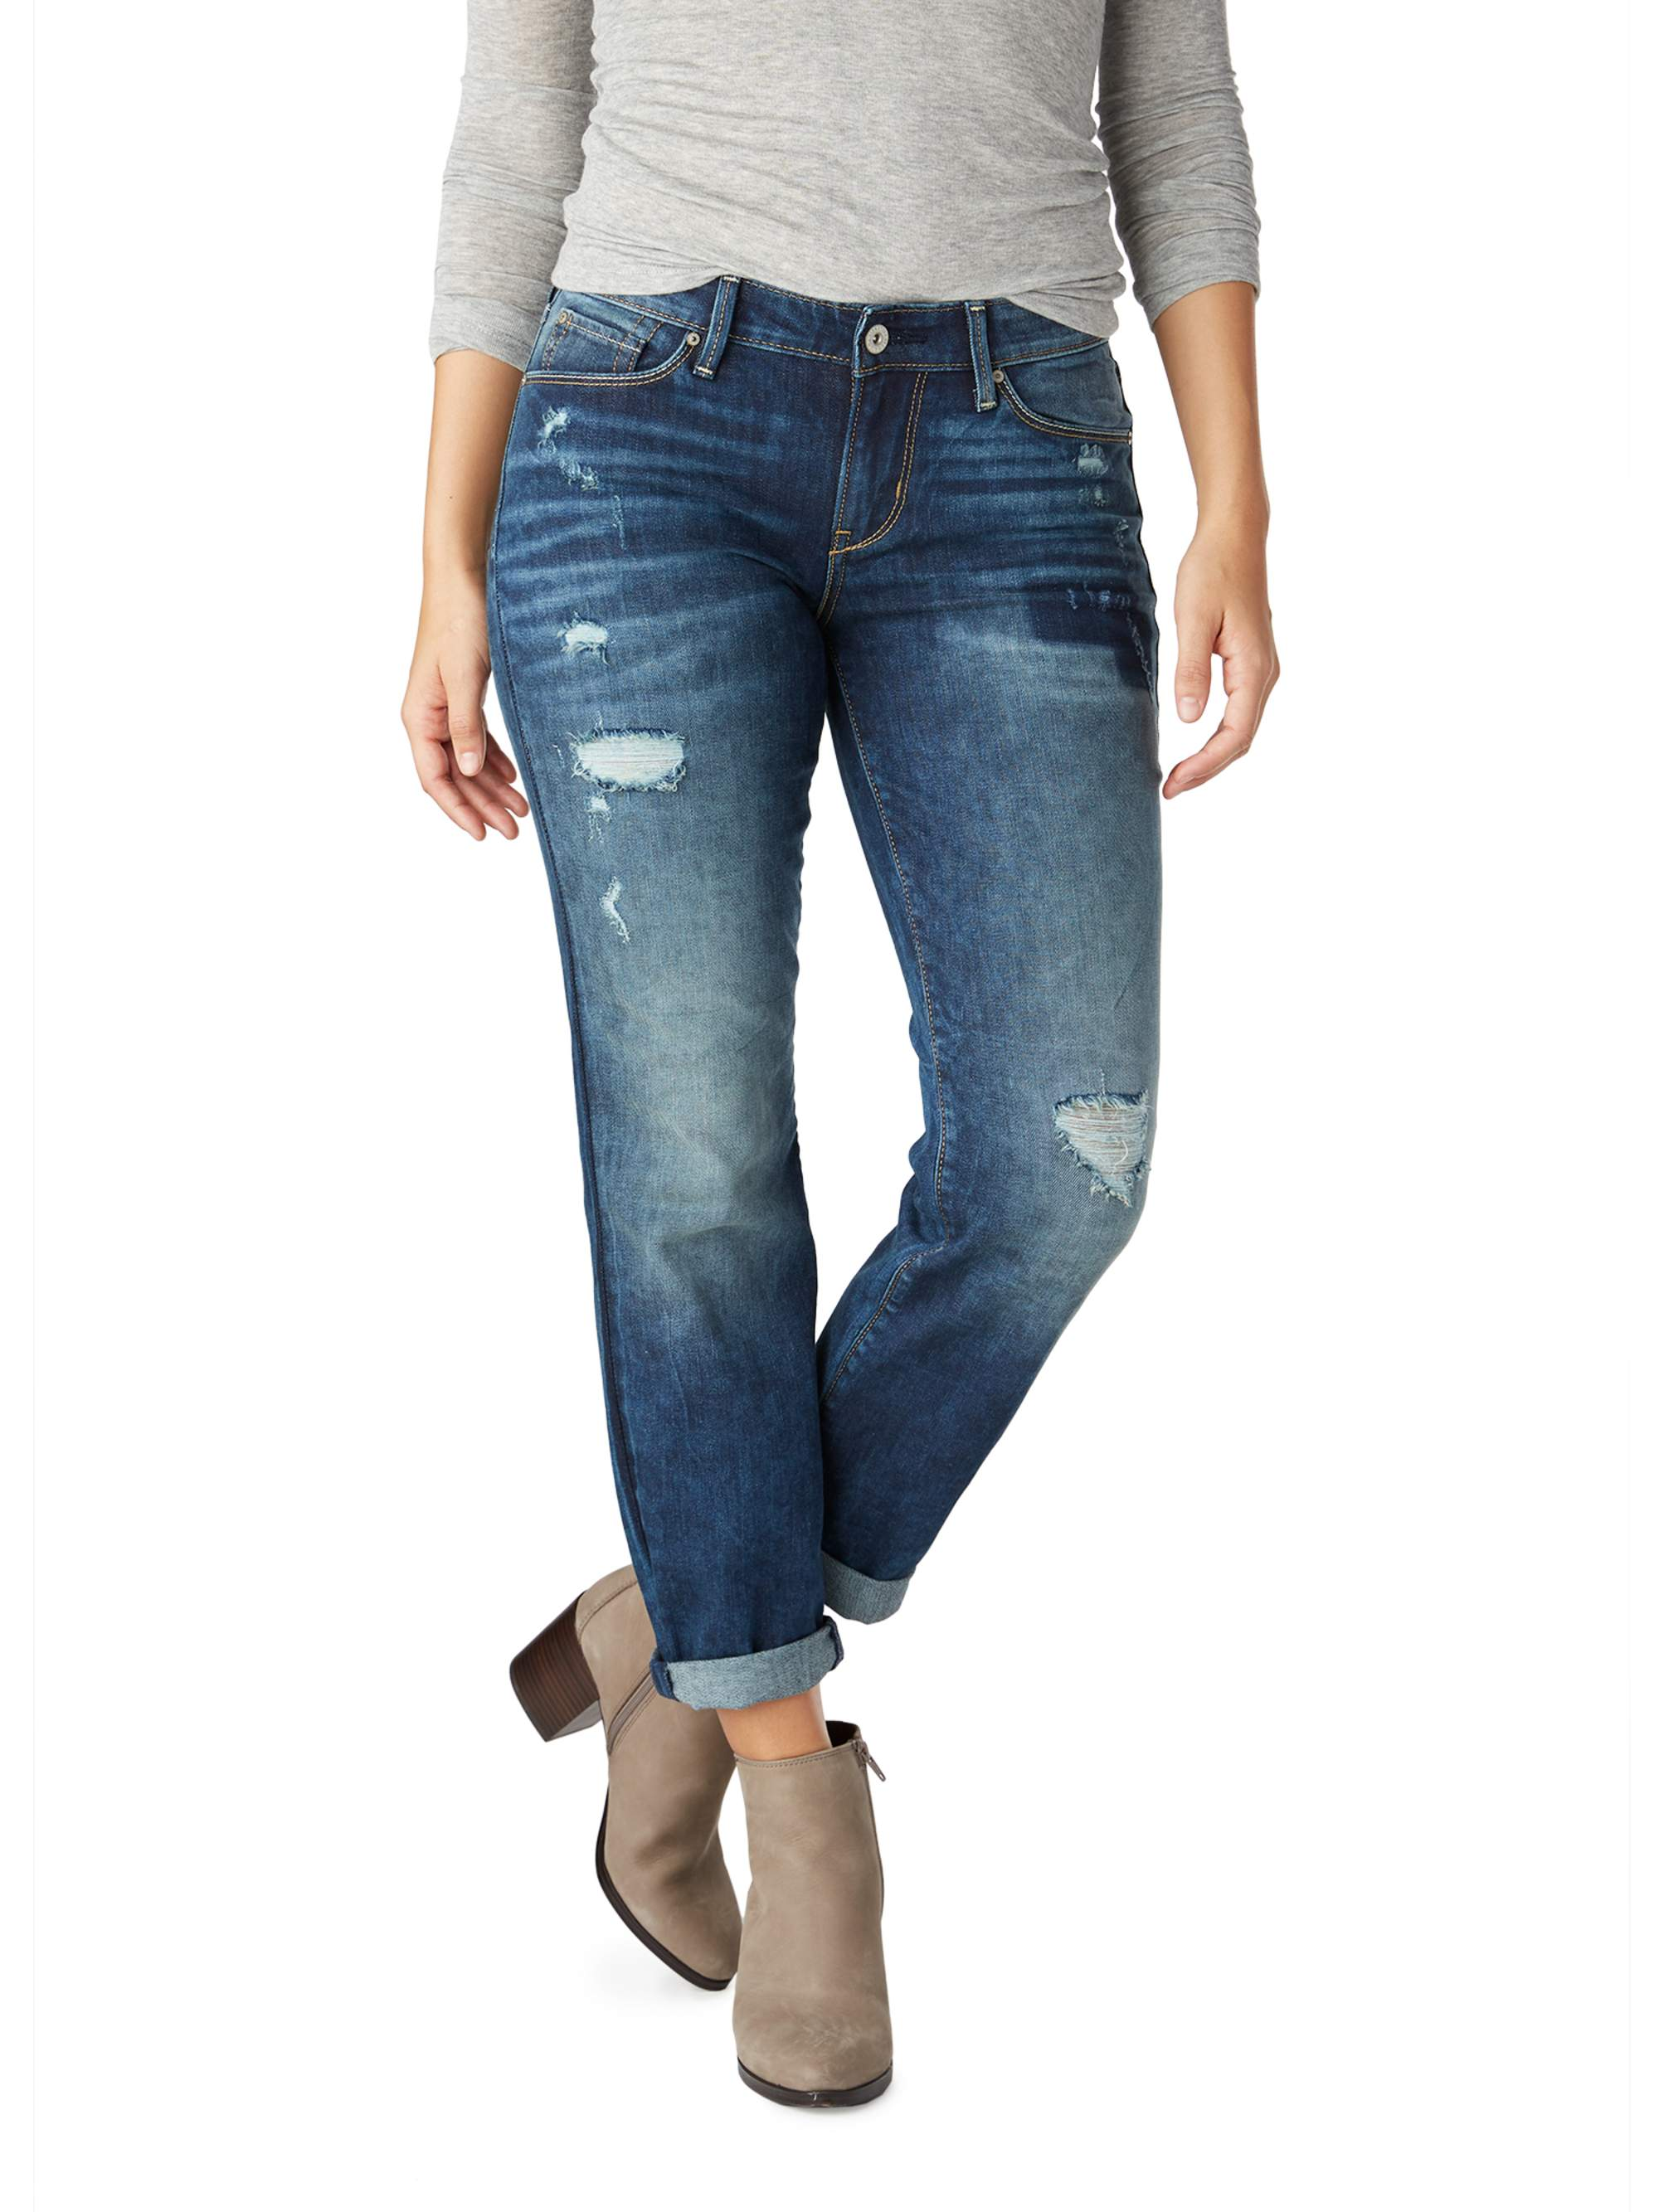 Signature by Levi Strauss & Co. Women's Modern Slim Cuffed Jean